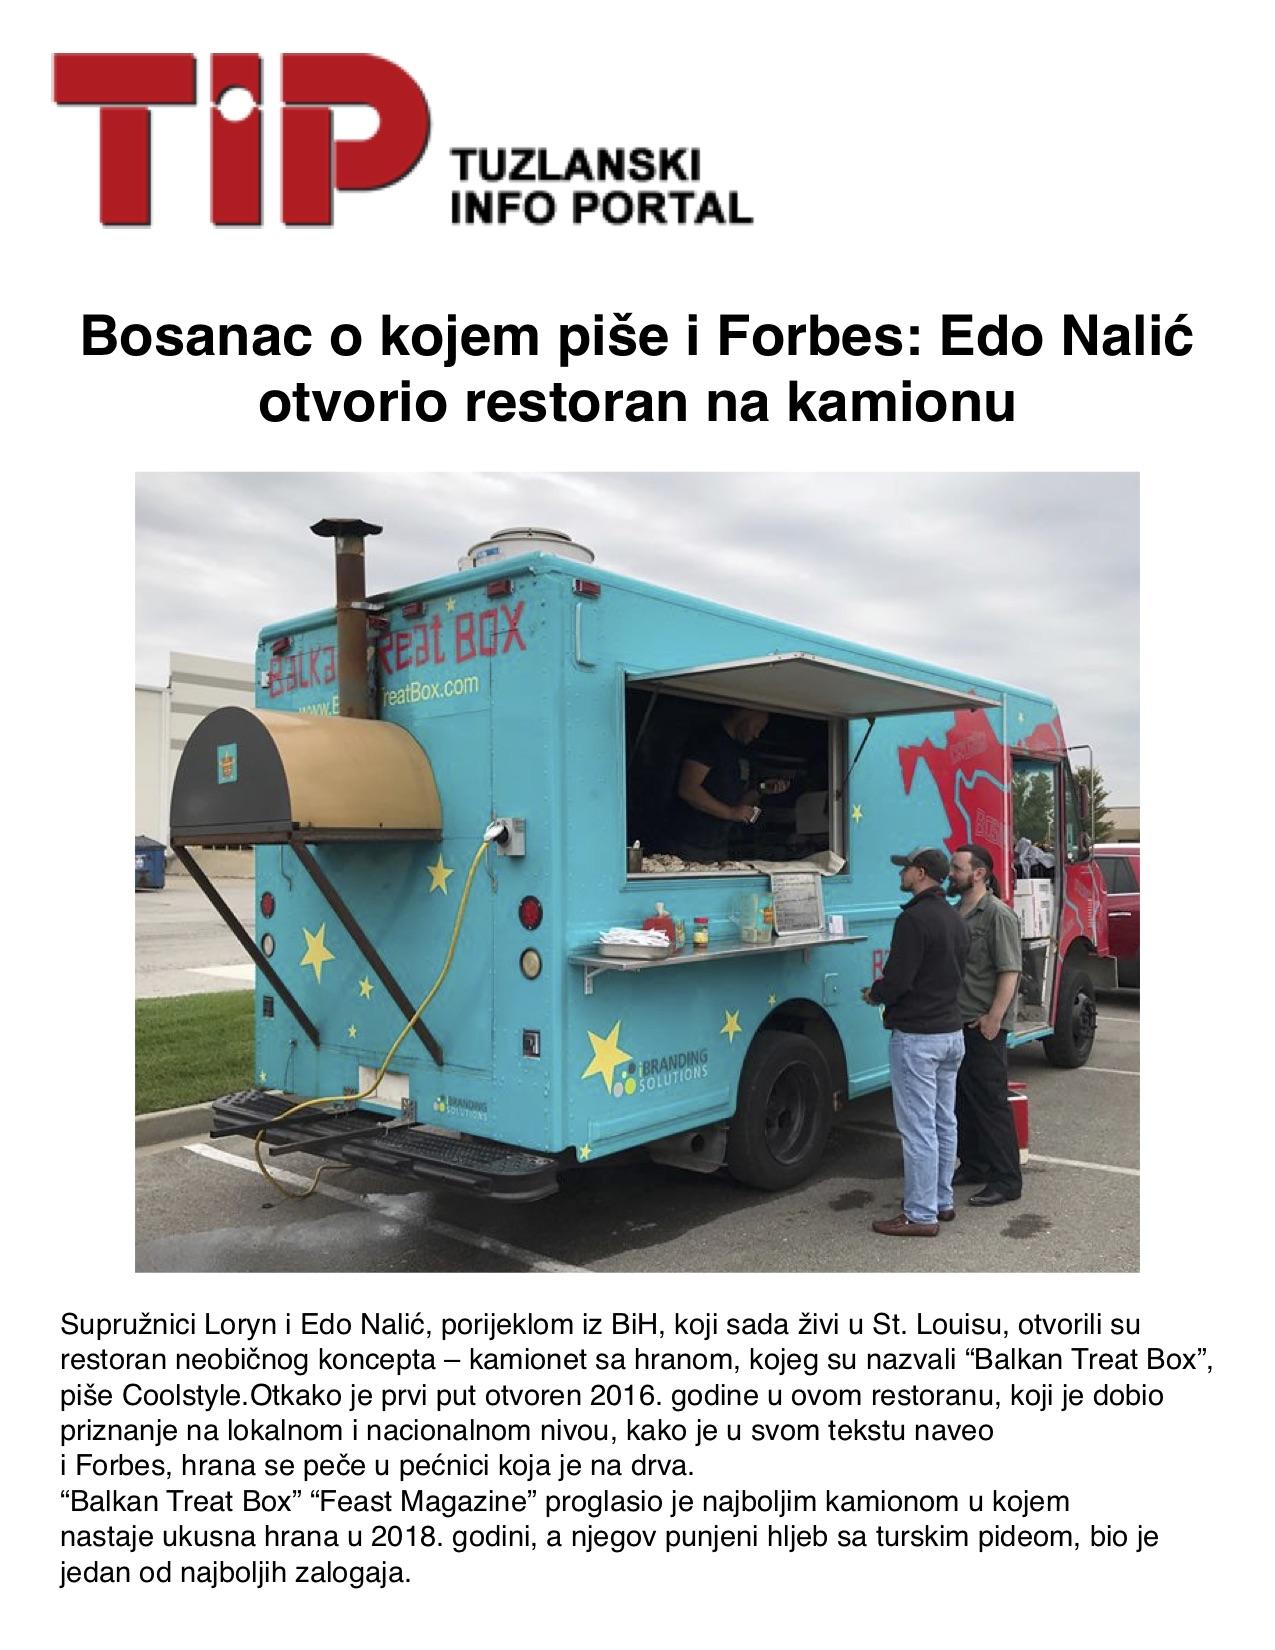 Tuzlanski Info Portal.jpg